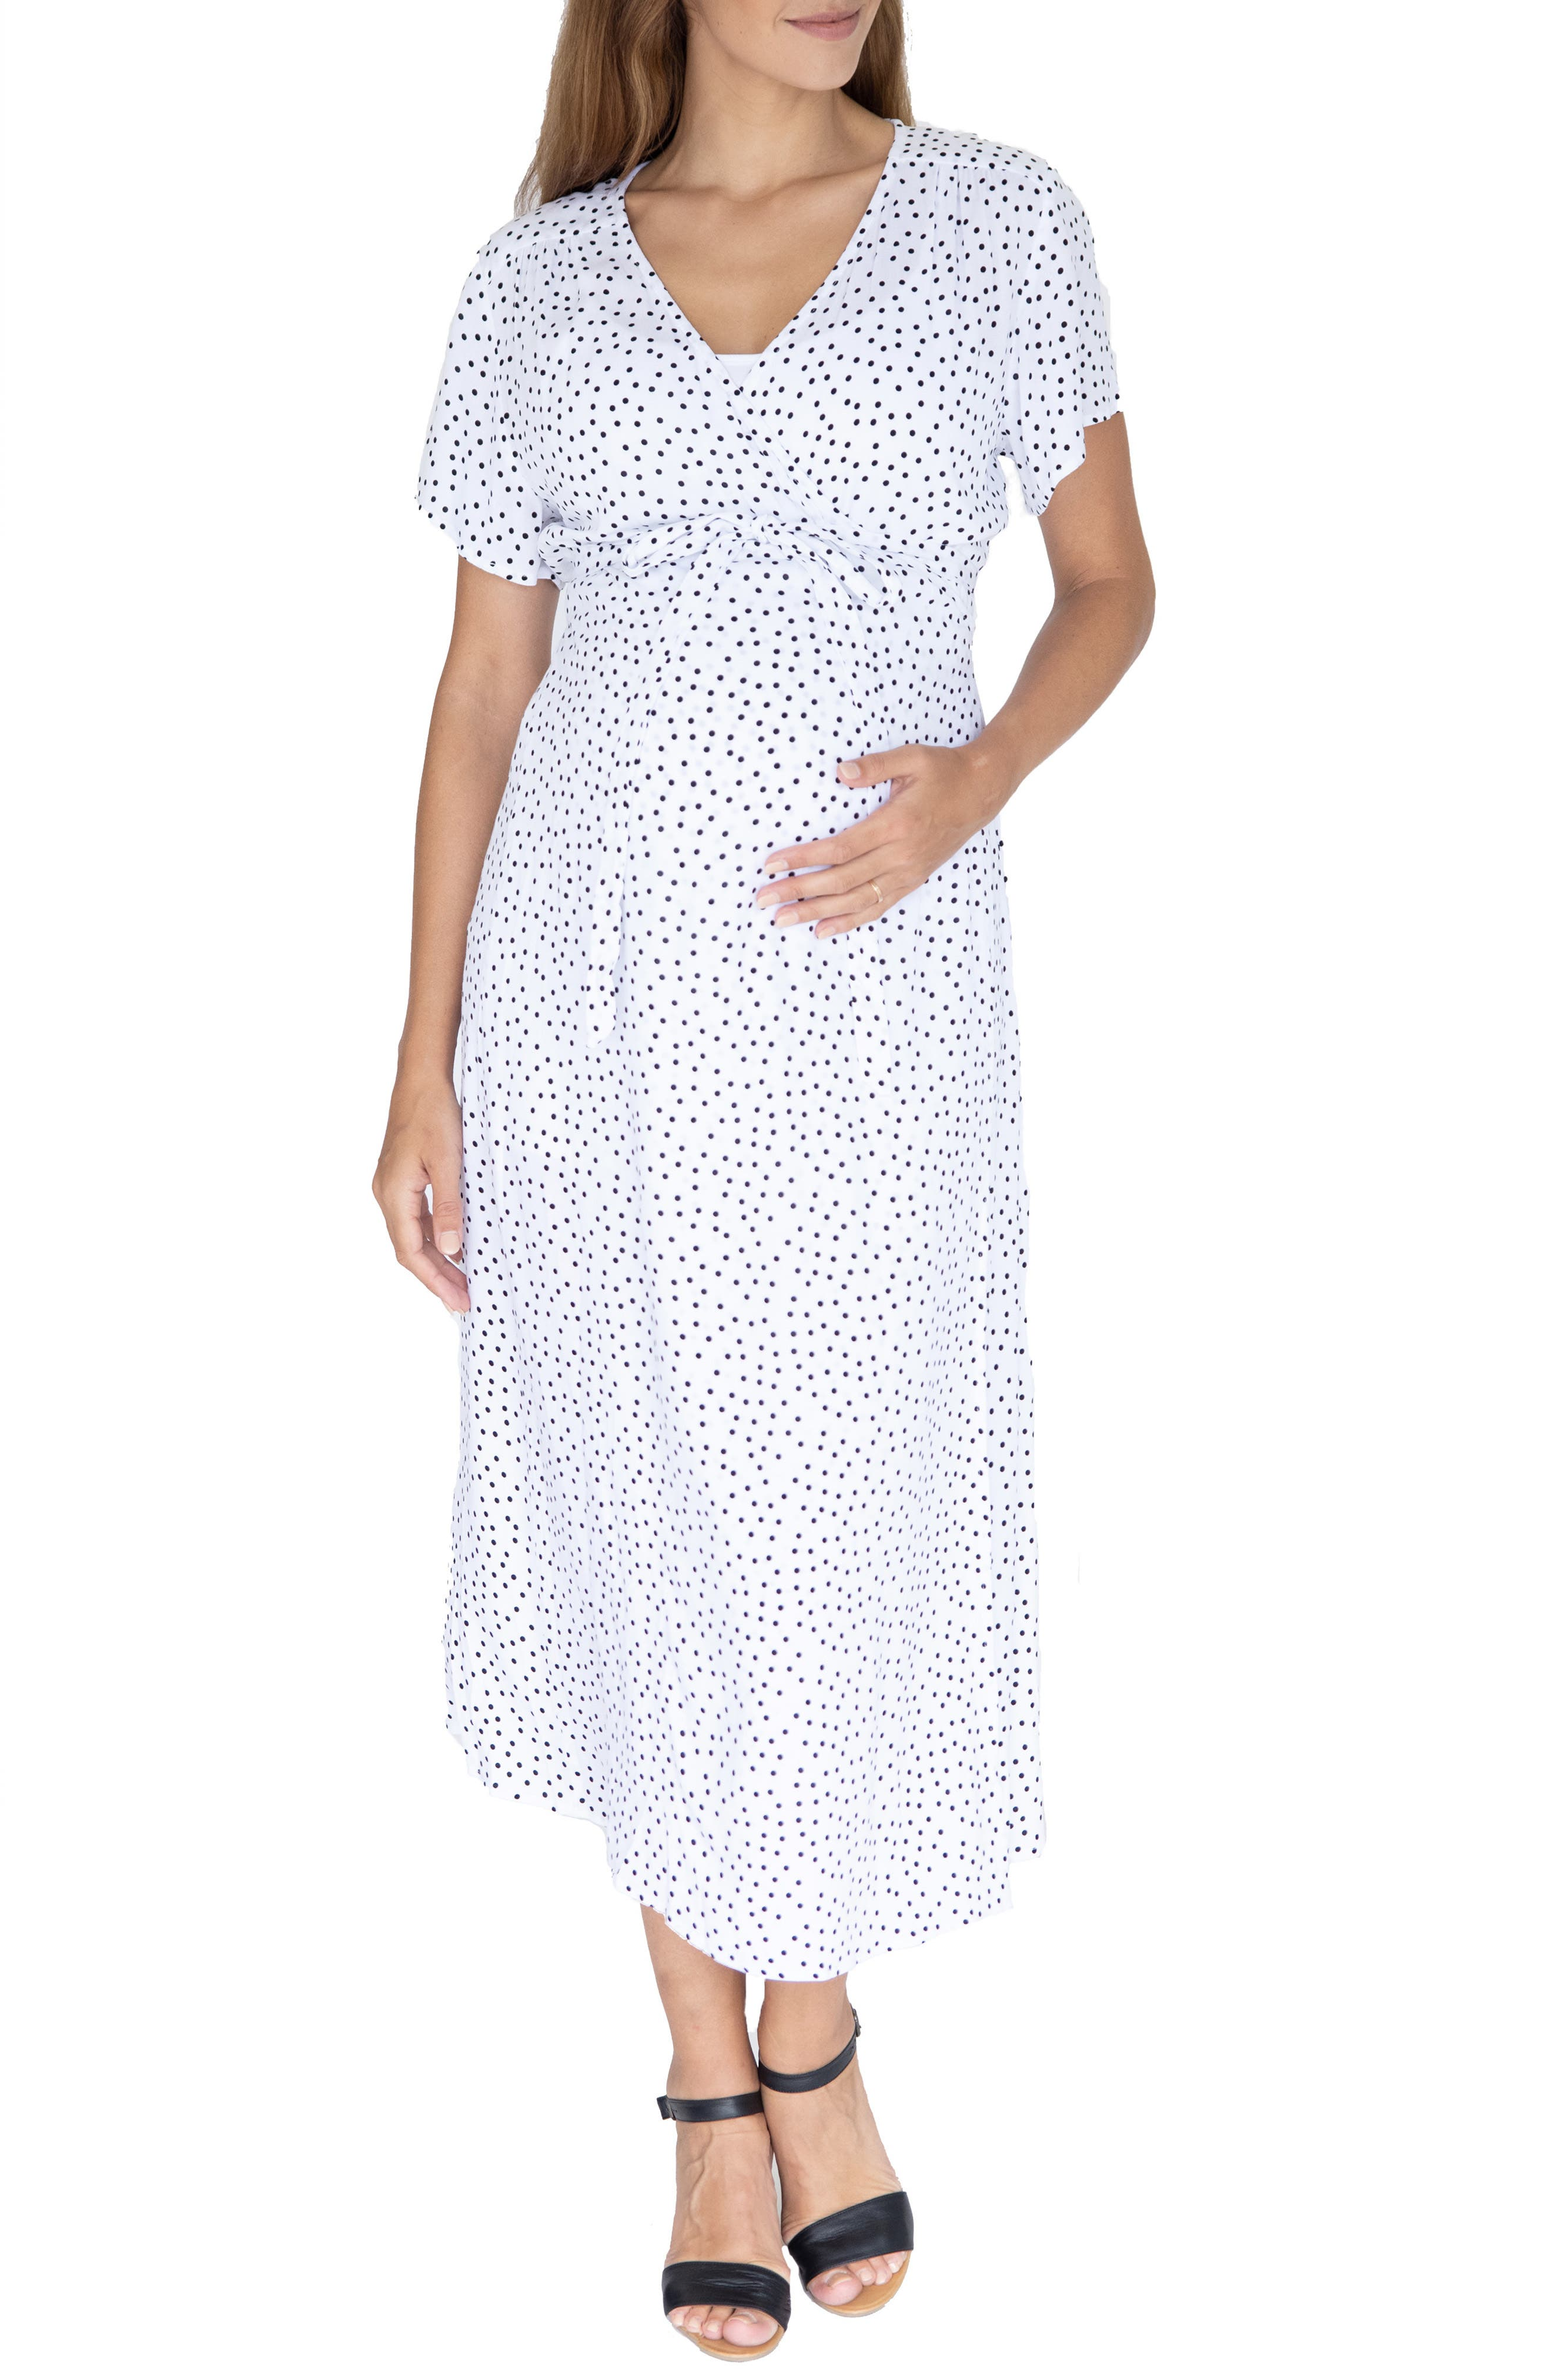 Vintage Maternity Clothes History Womens Angel Maternity Polka Dot Empire Waist Maternitynursing Dress Size Small - White $69.95 AT vintagedancer.com